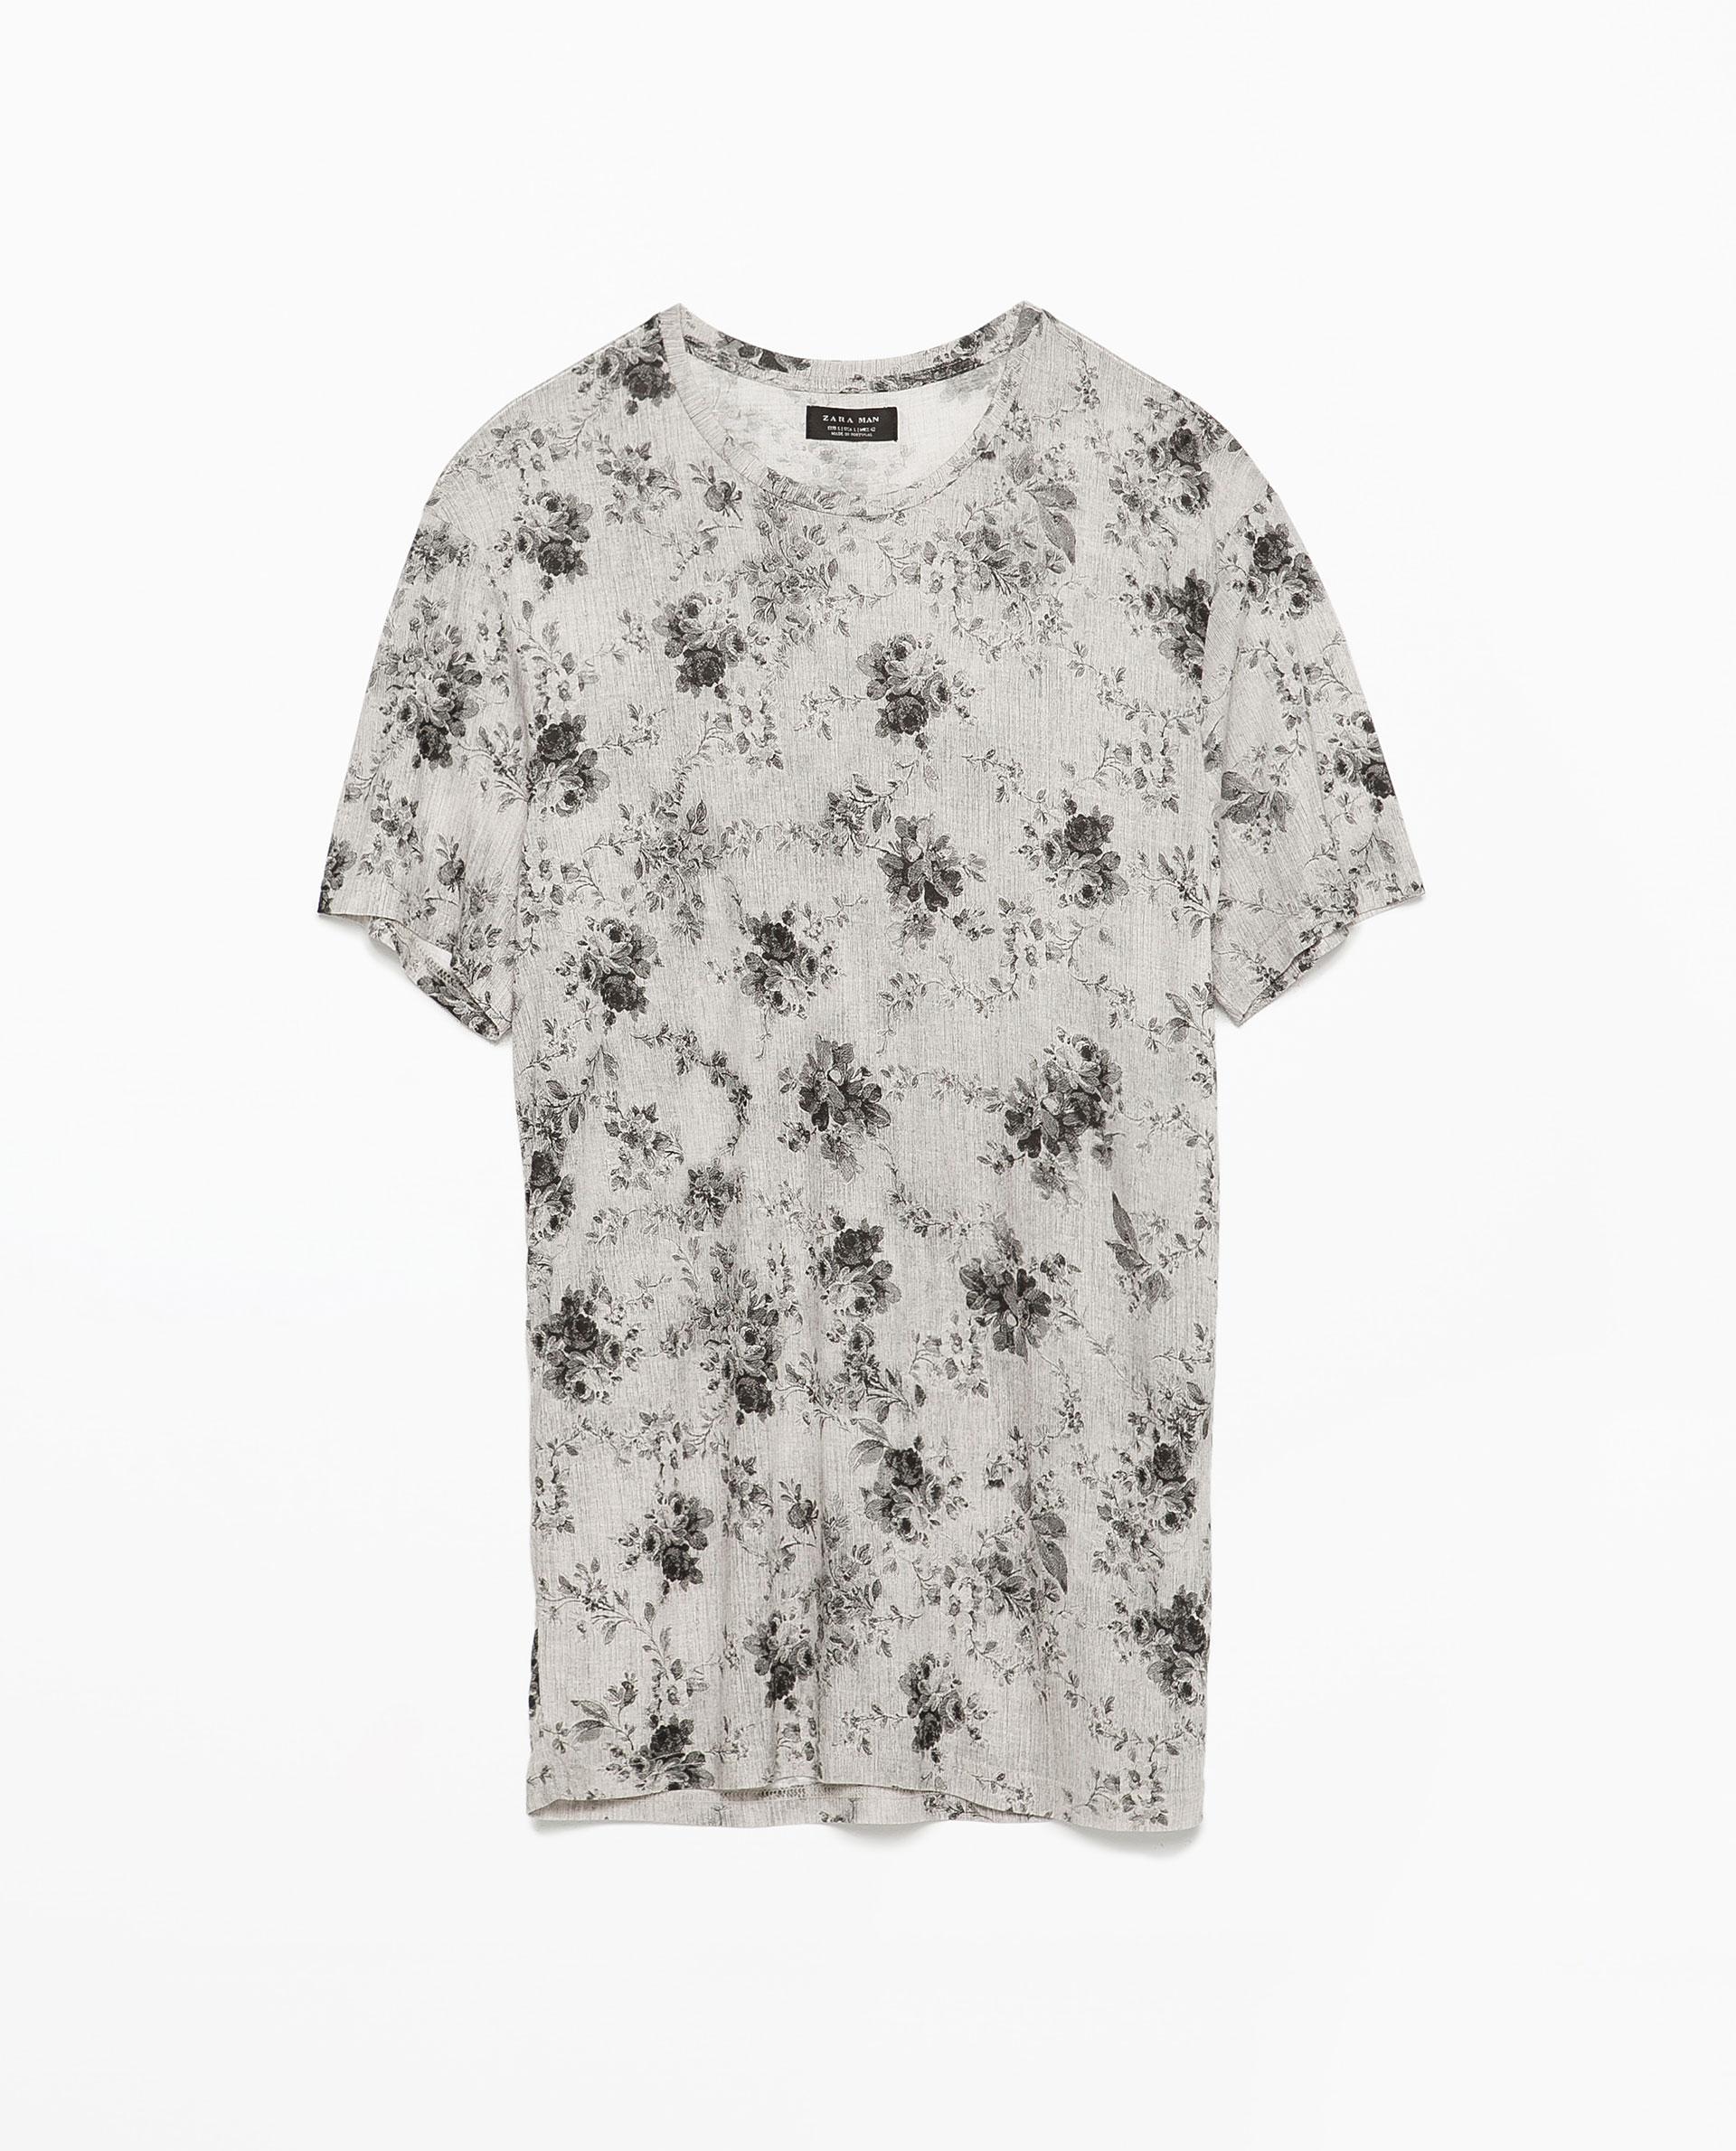 Zara floral t shirt in gray for men grey marl lyst for Zara mens floral shirt